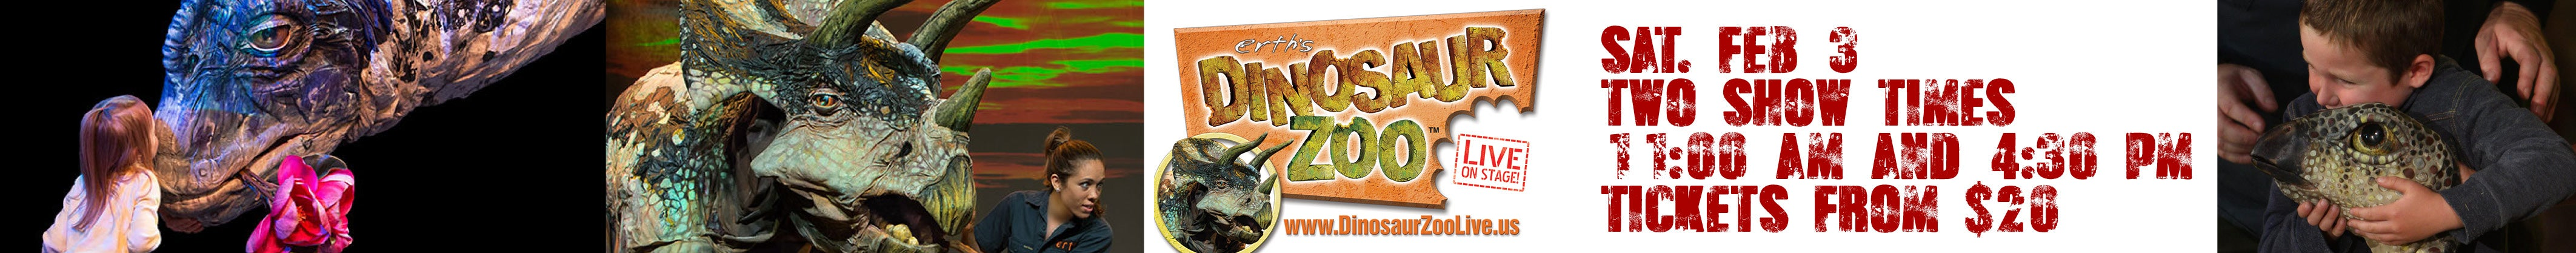 zoo banner.jpg